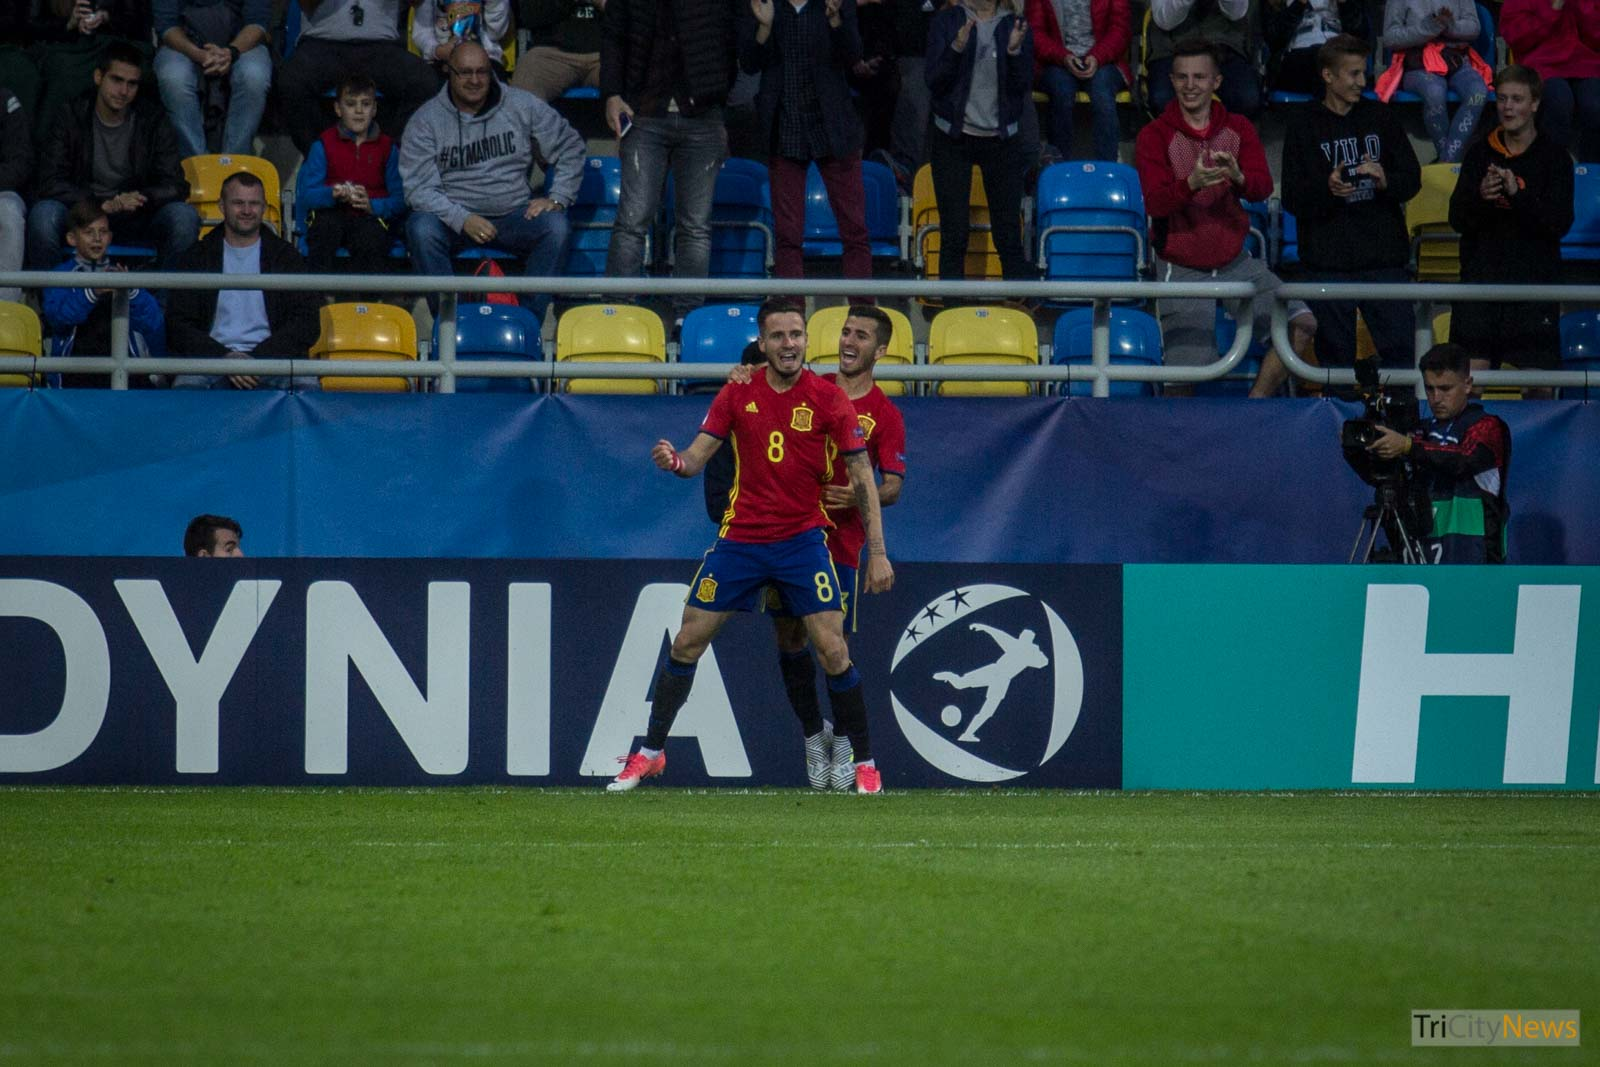 Saul scoring a goal in Gdynia at UEFA U21 European Championship, photo: Jakub Wozniak/Tricity News